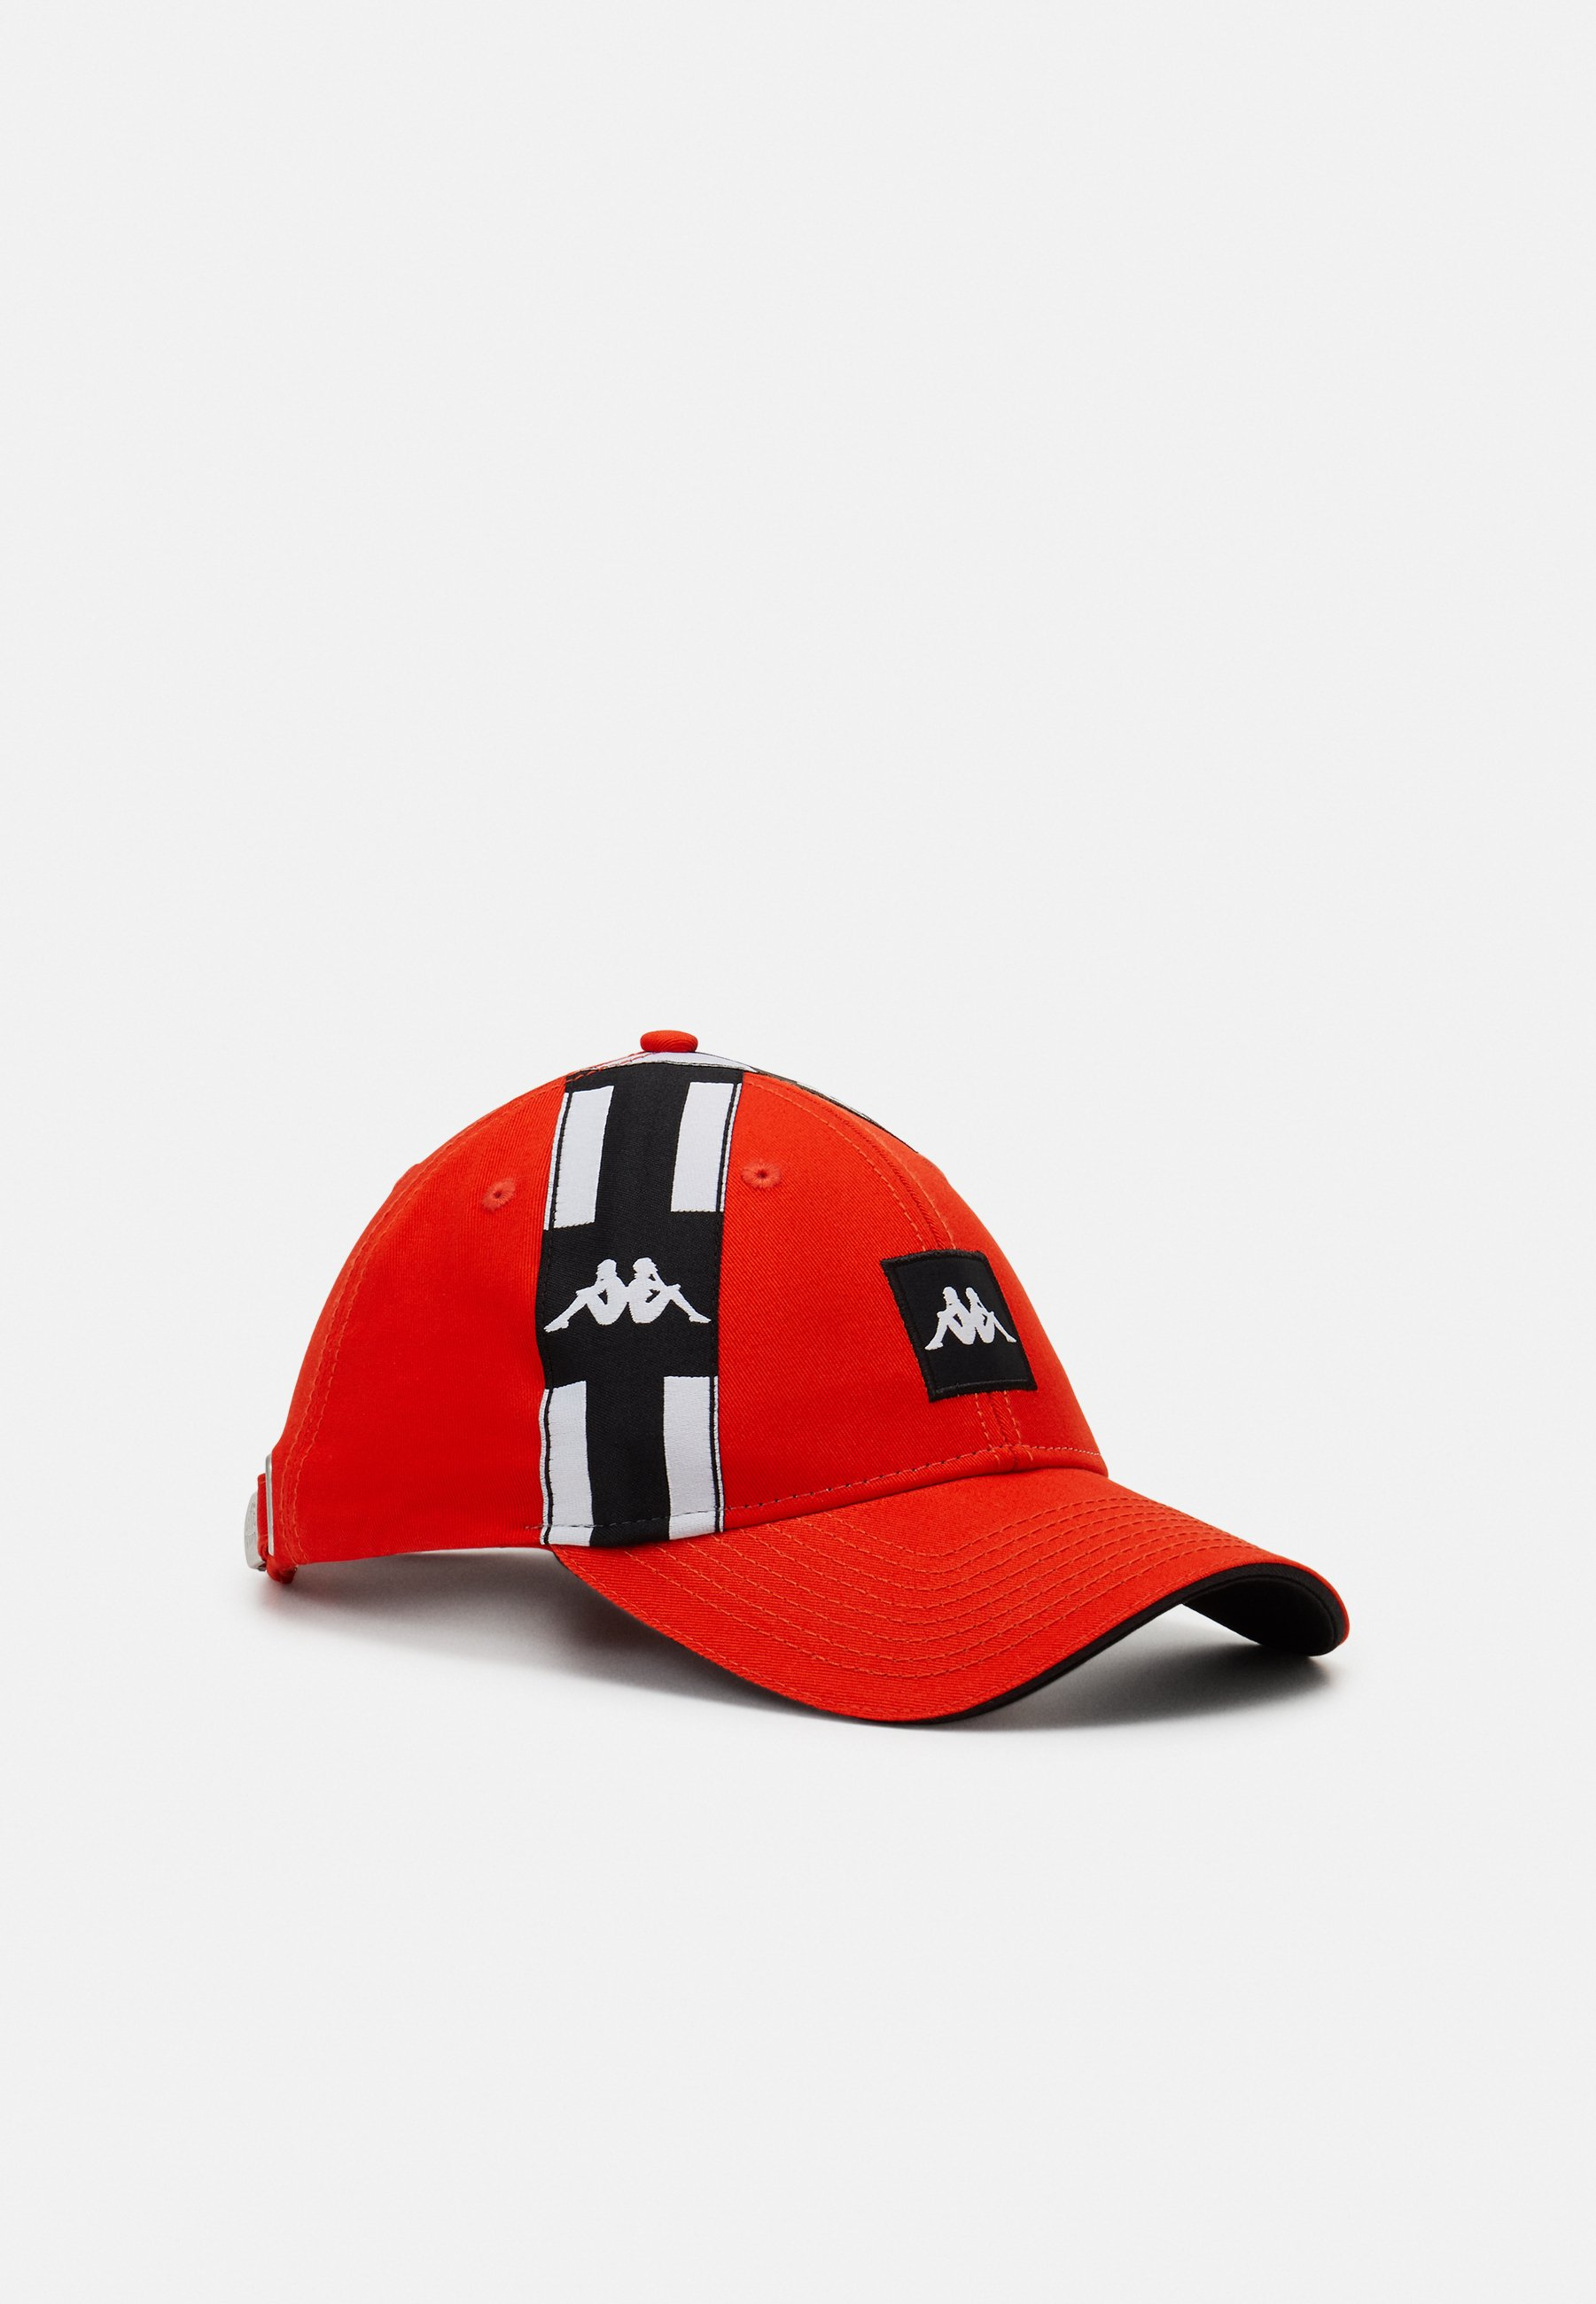 Kappa Unisex Kids Hybe Cap